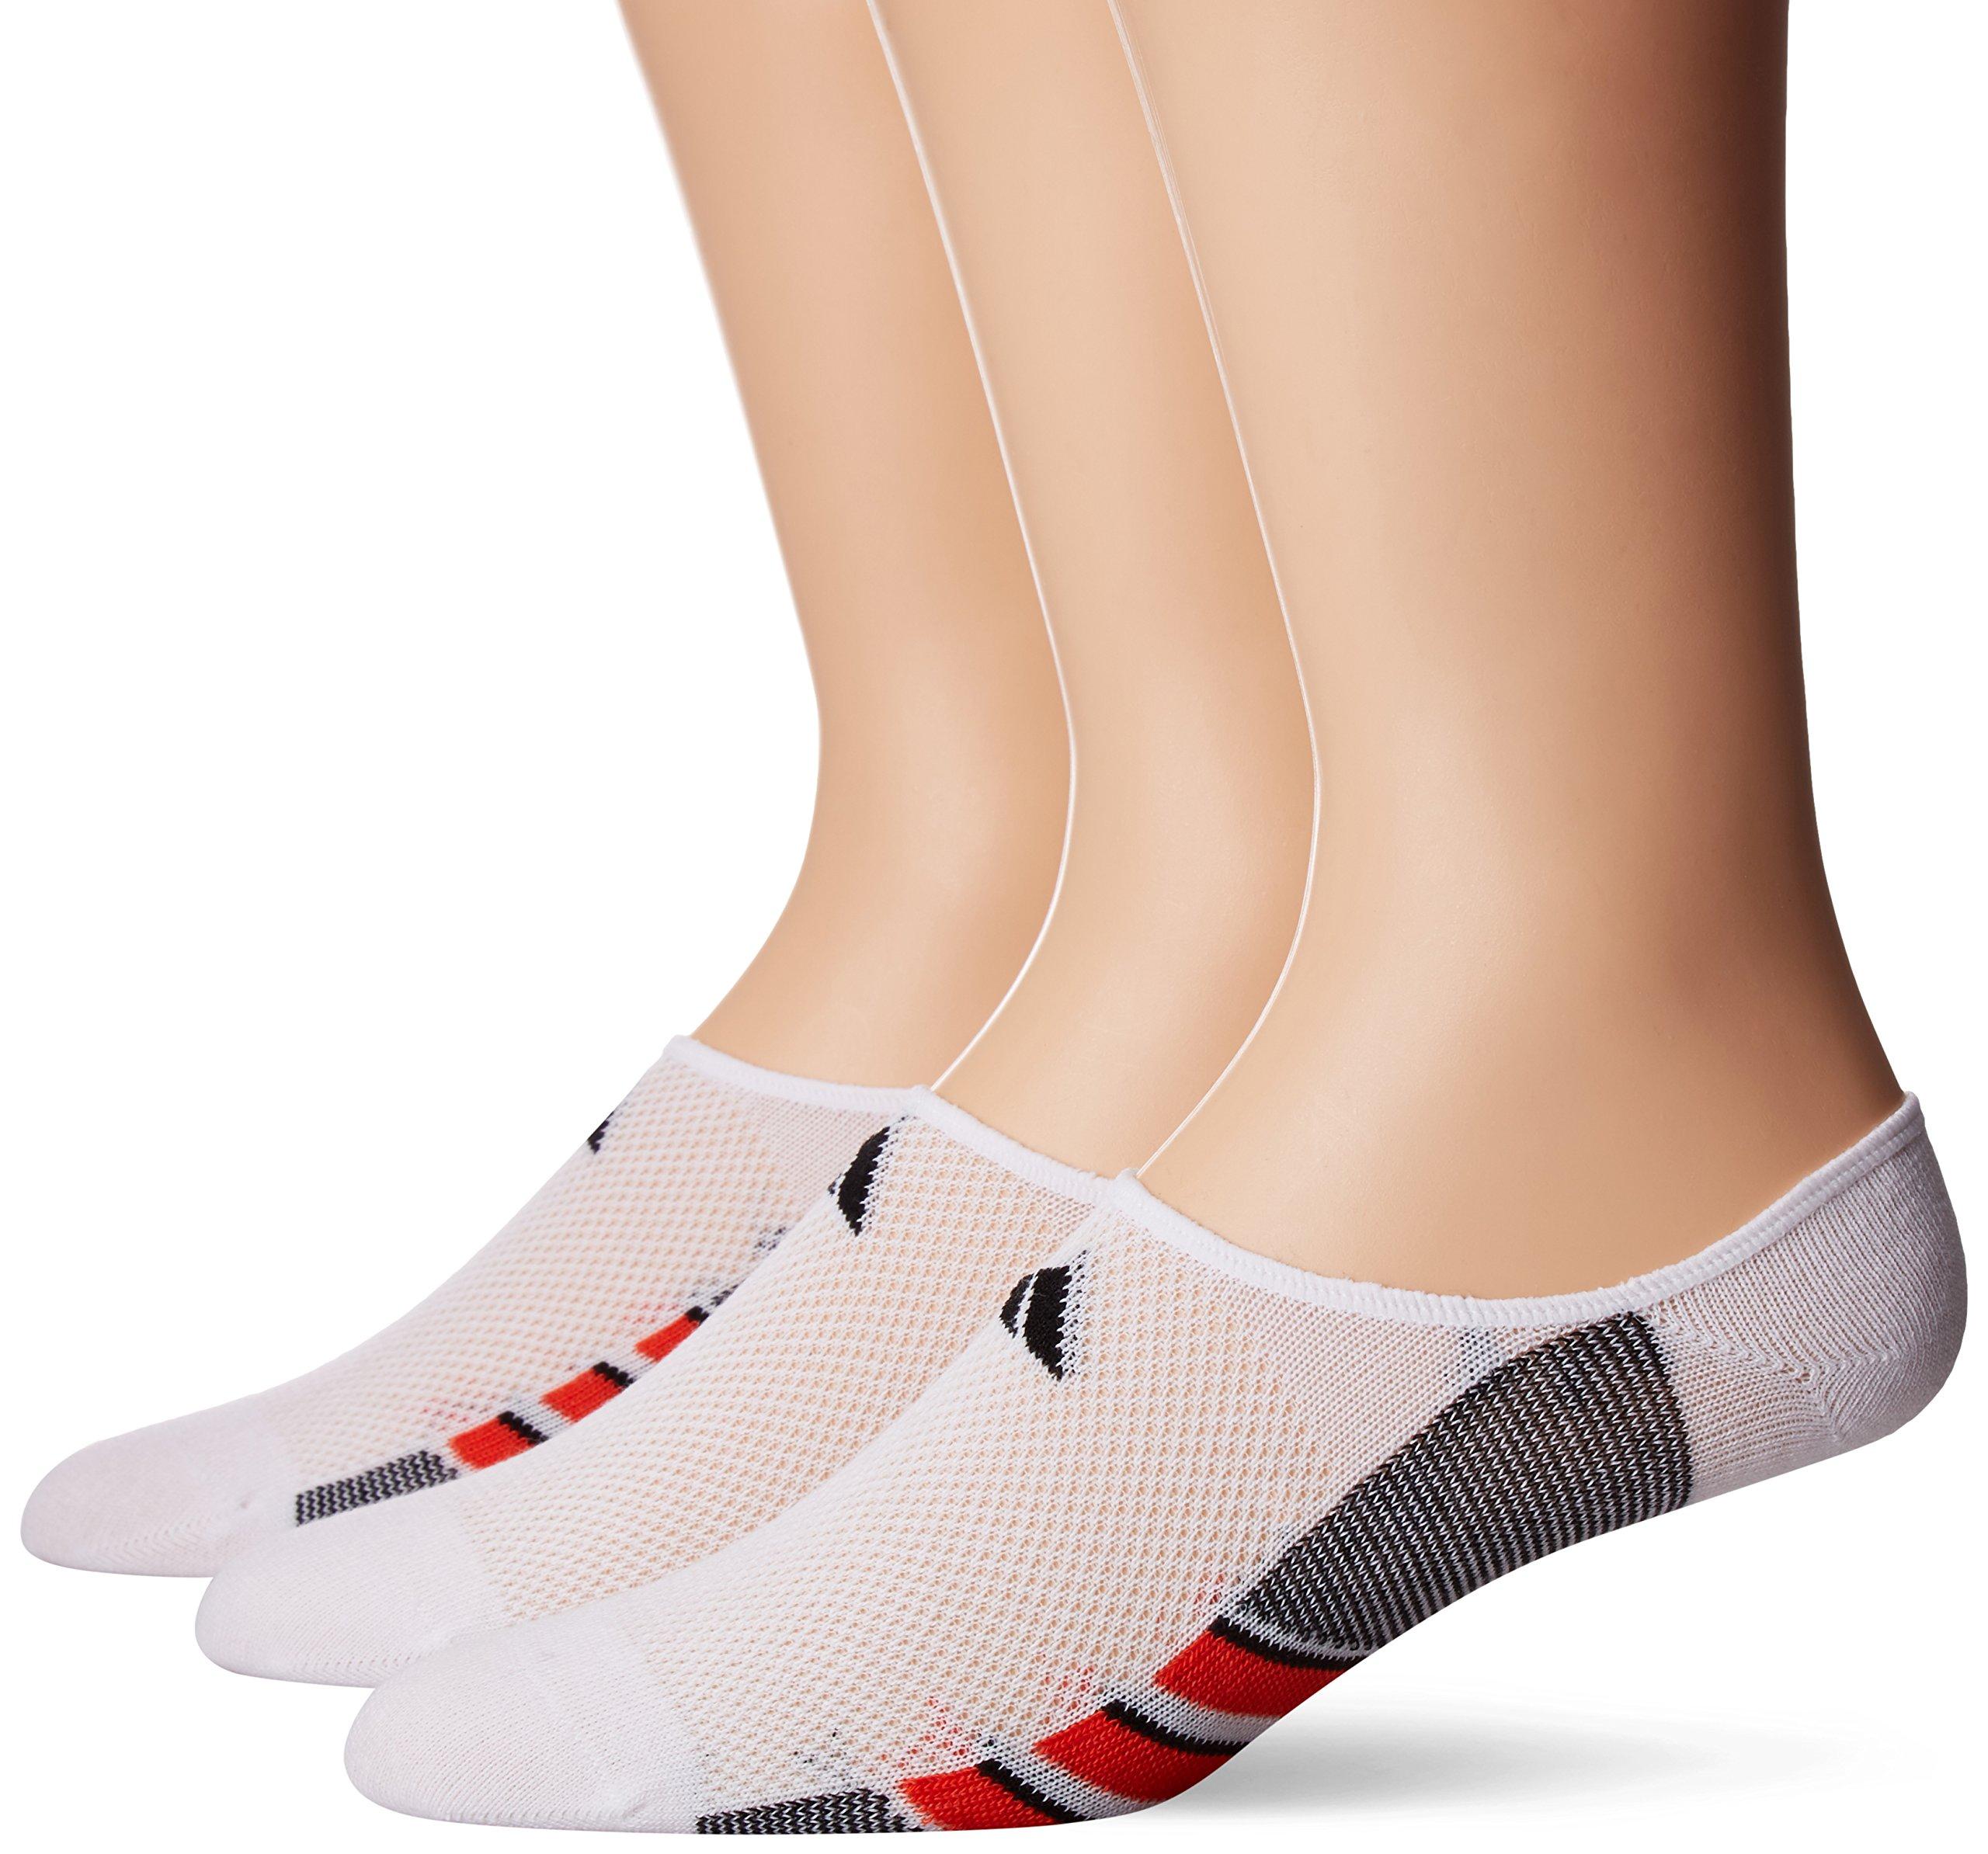 adidas Men's Climacool Superlite Super No Show Socks (3 Pack), White/Energy Red/Black, Large